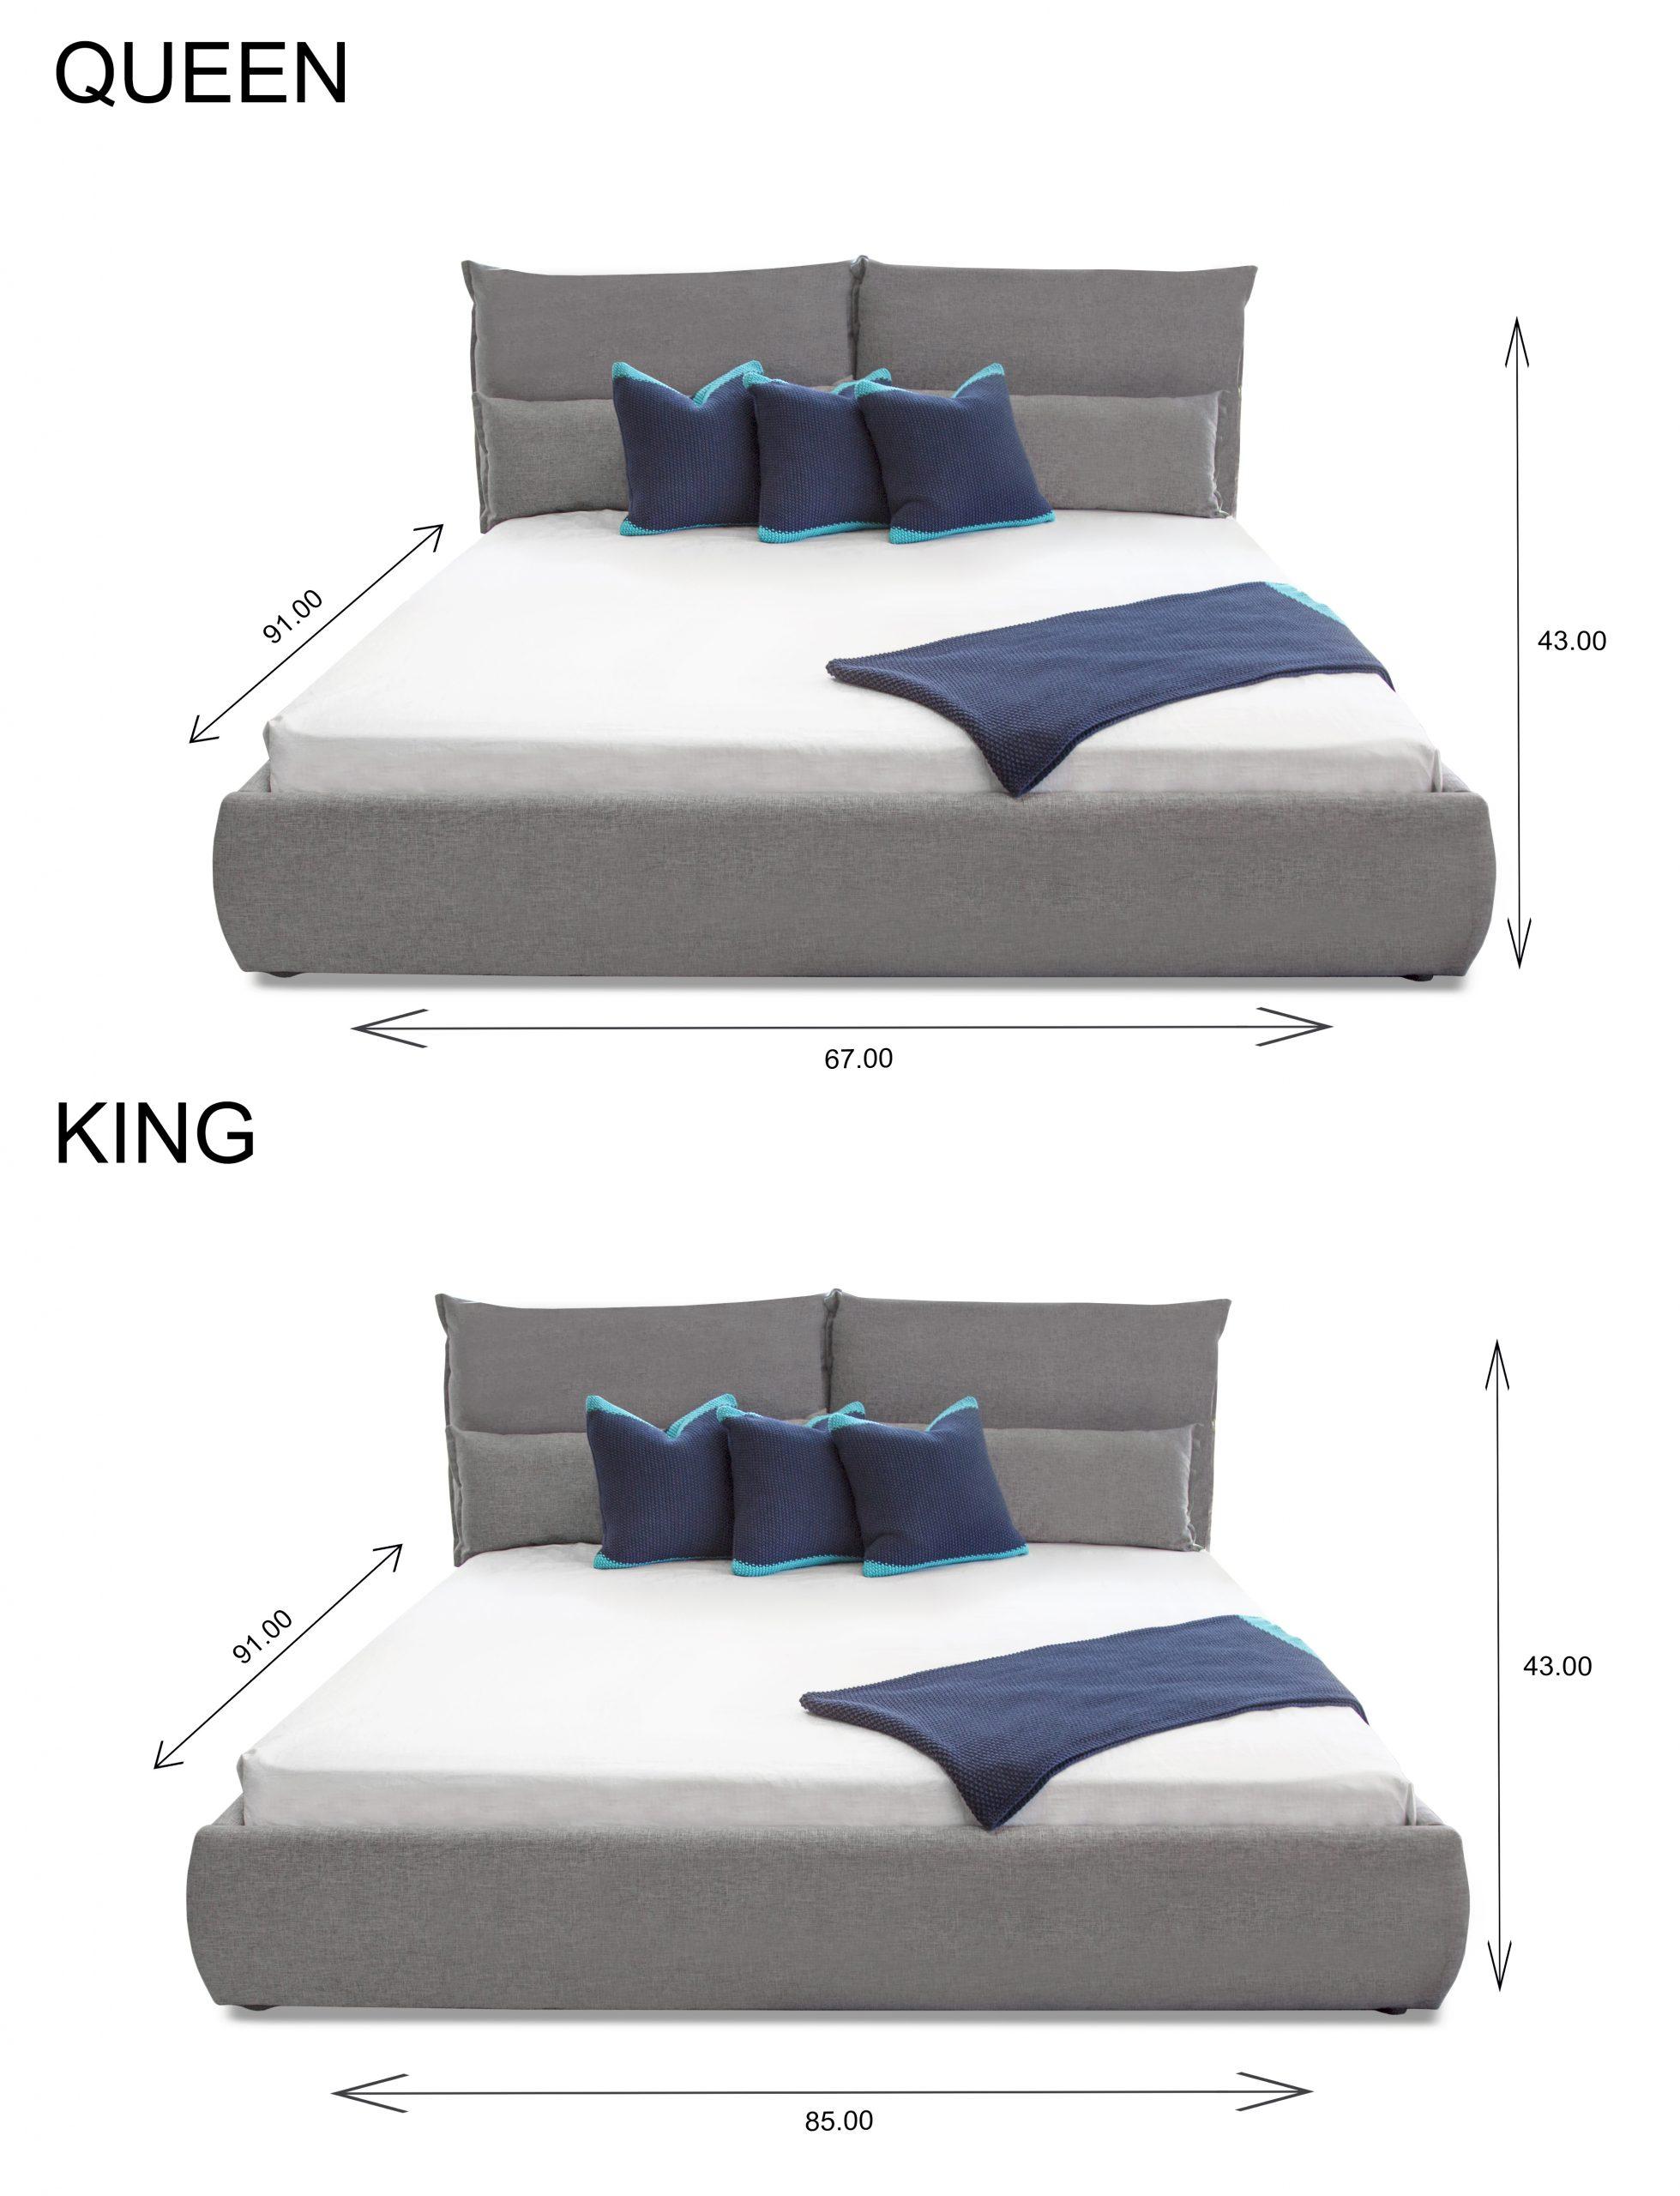 Mason Bed Dimensions